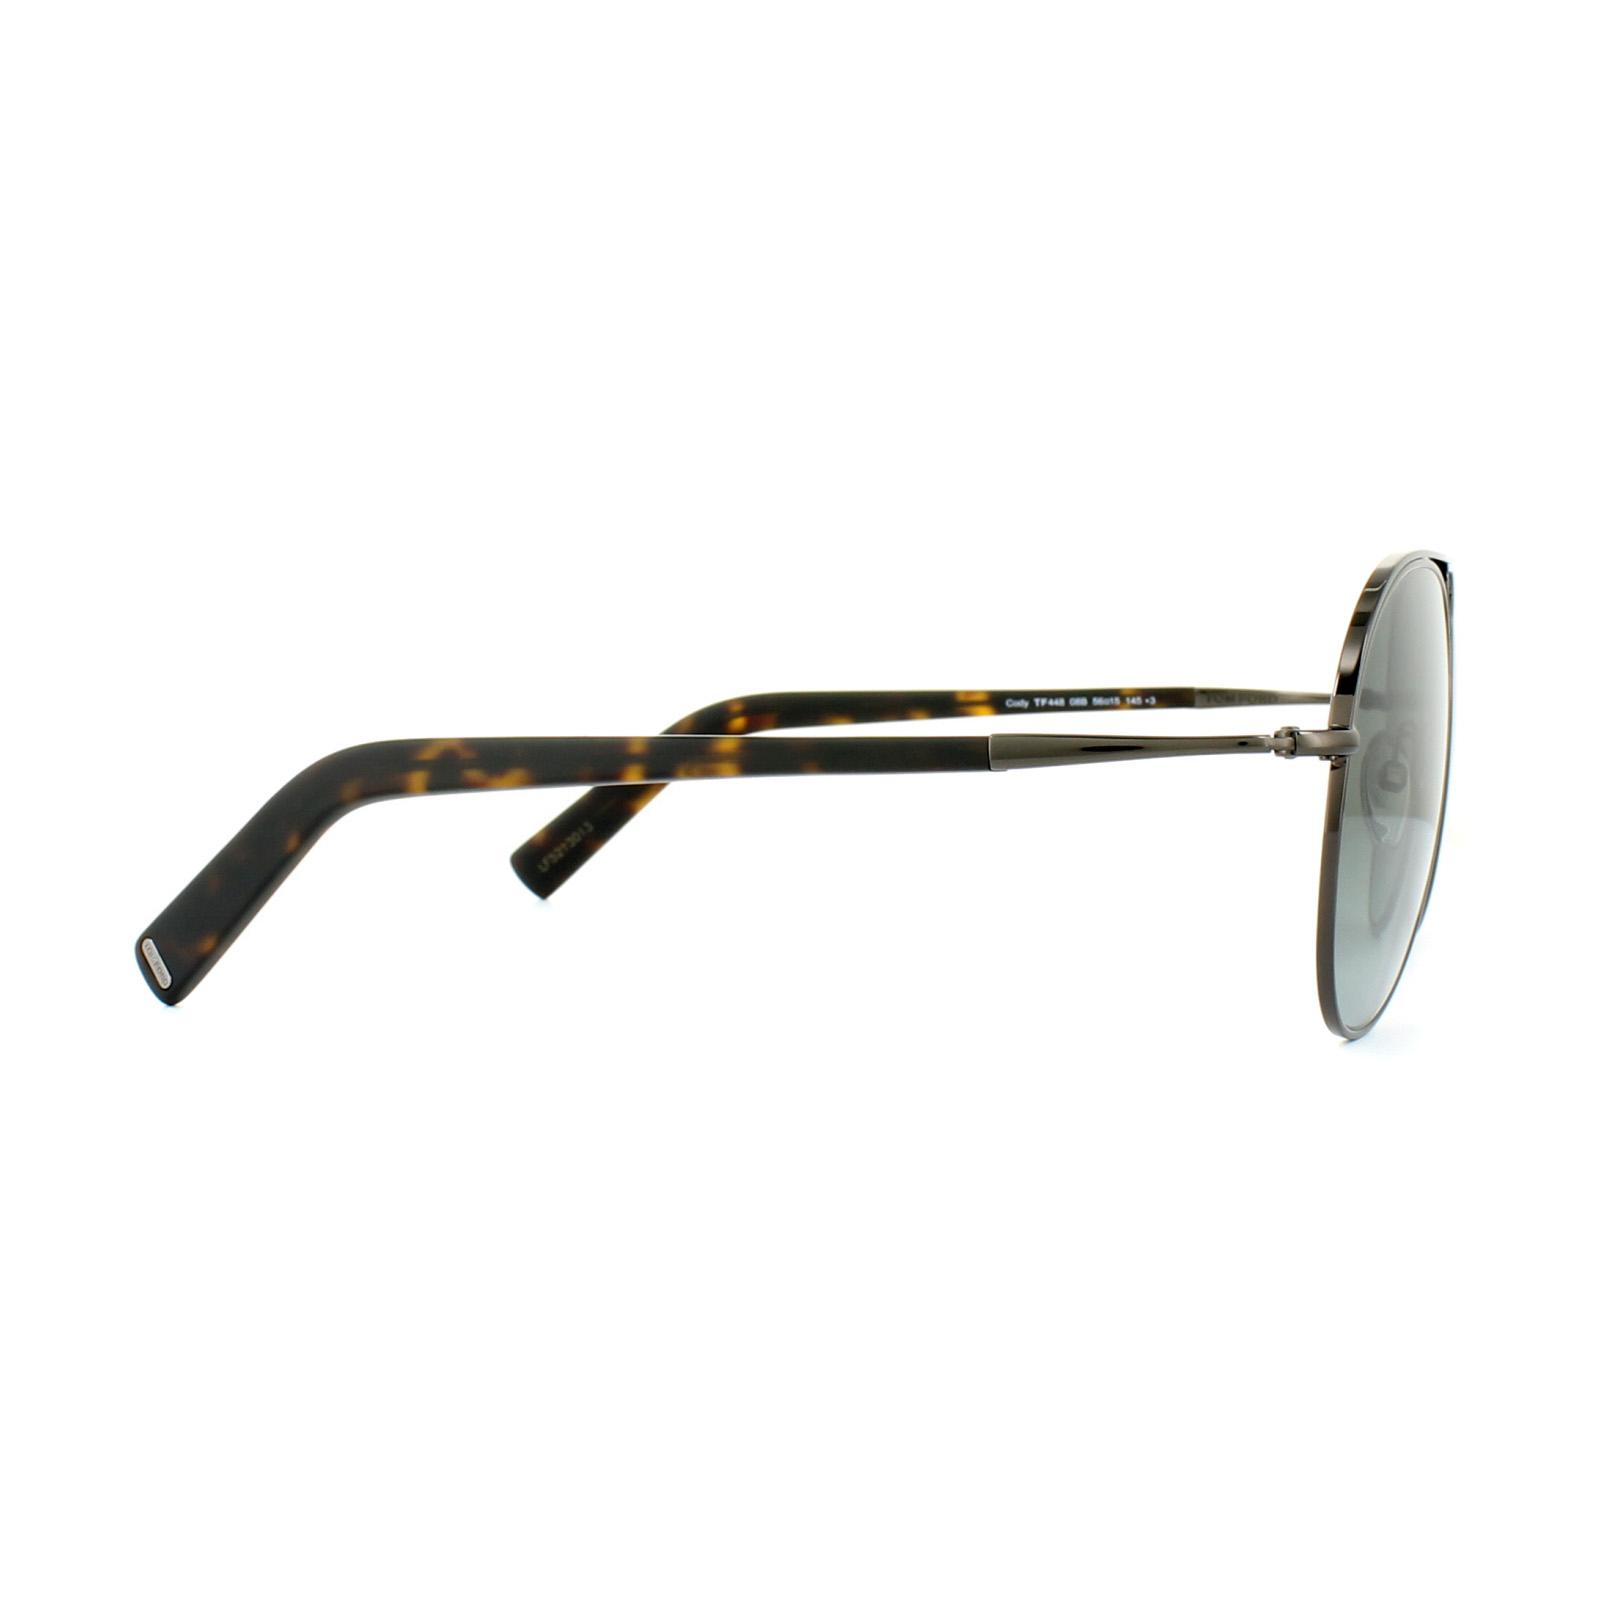 bd0362349c22d Cheap Tom Ford 0448 Cody Sunglasses - Discounted Sunglasses